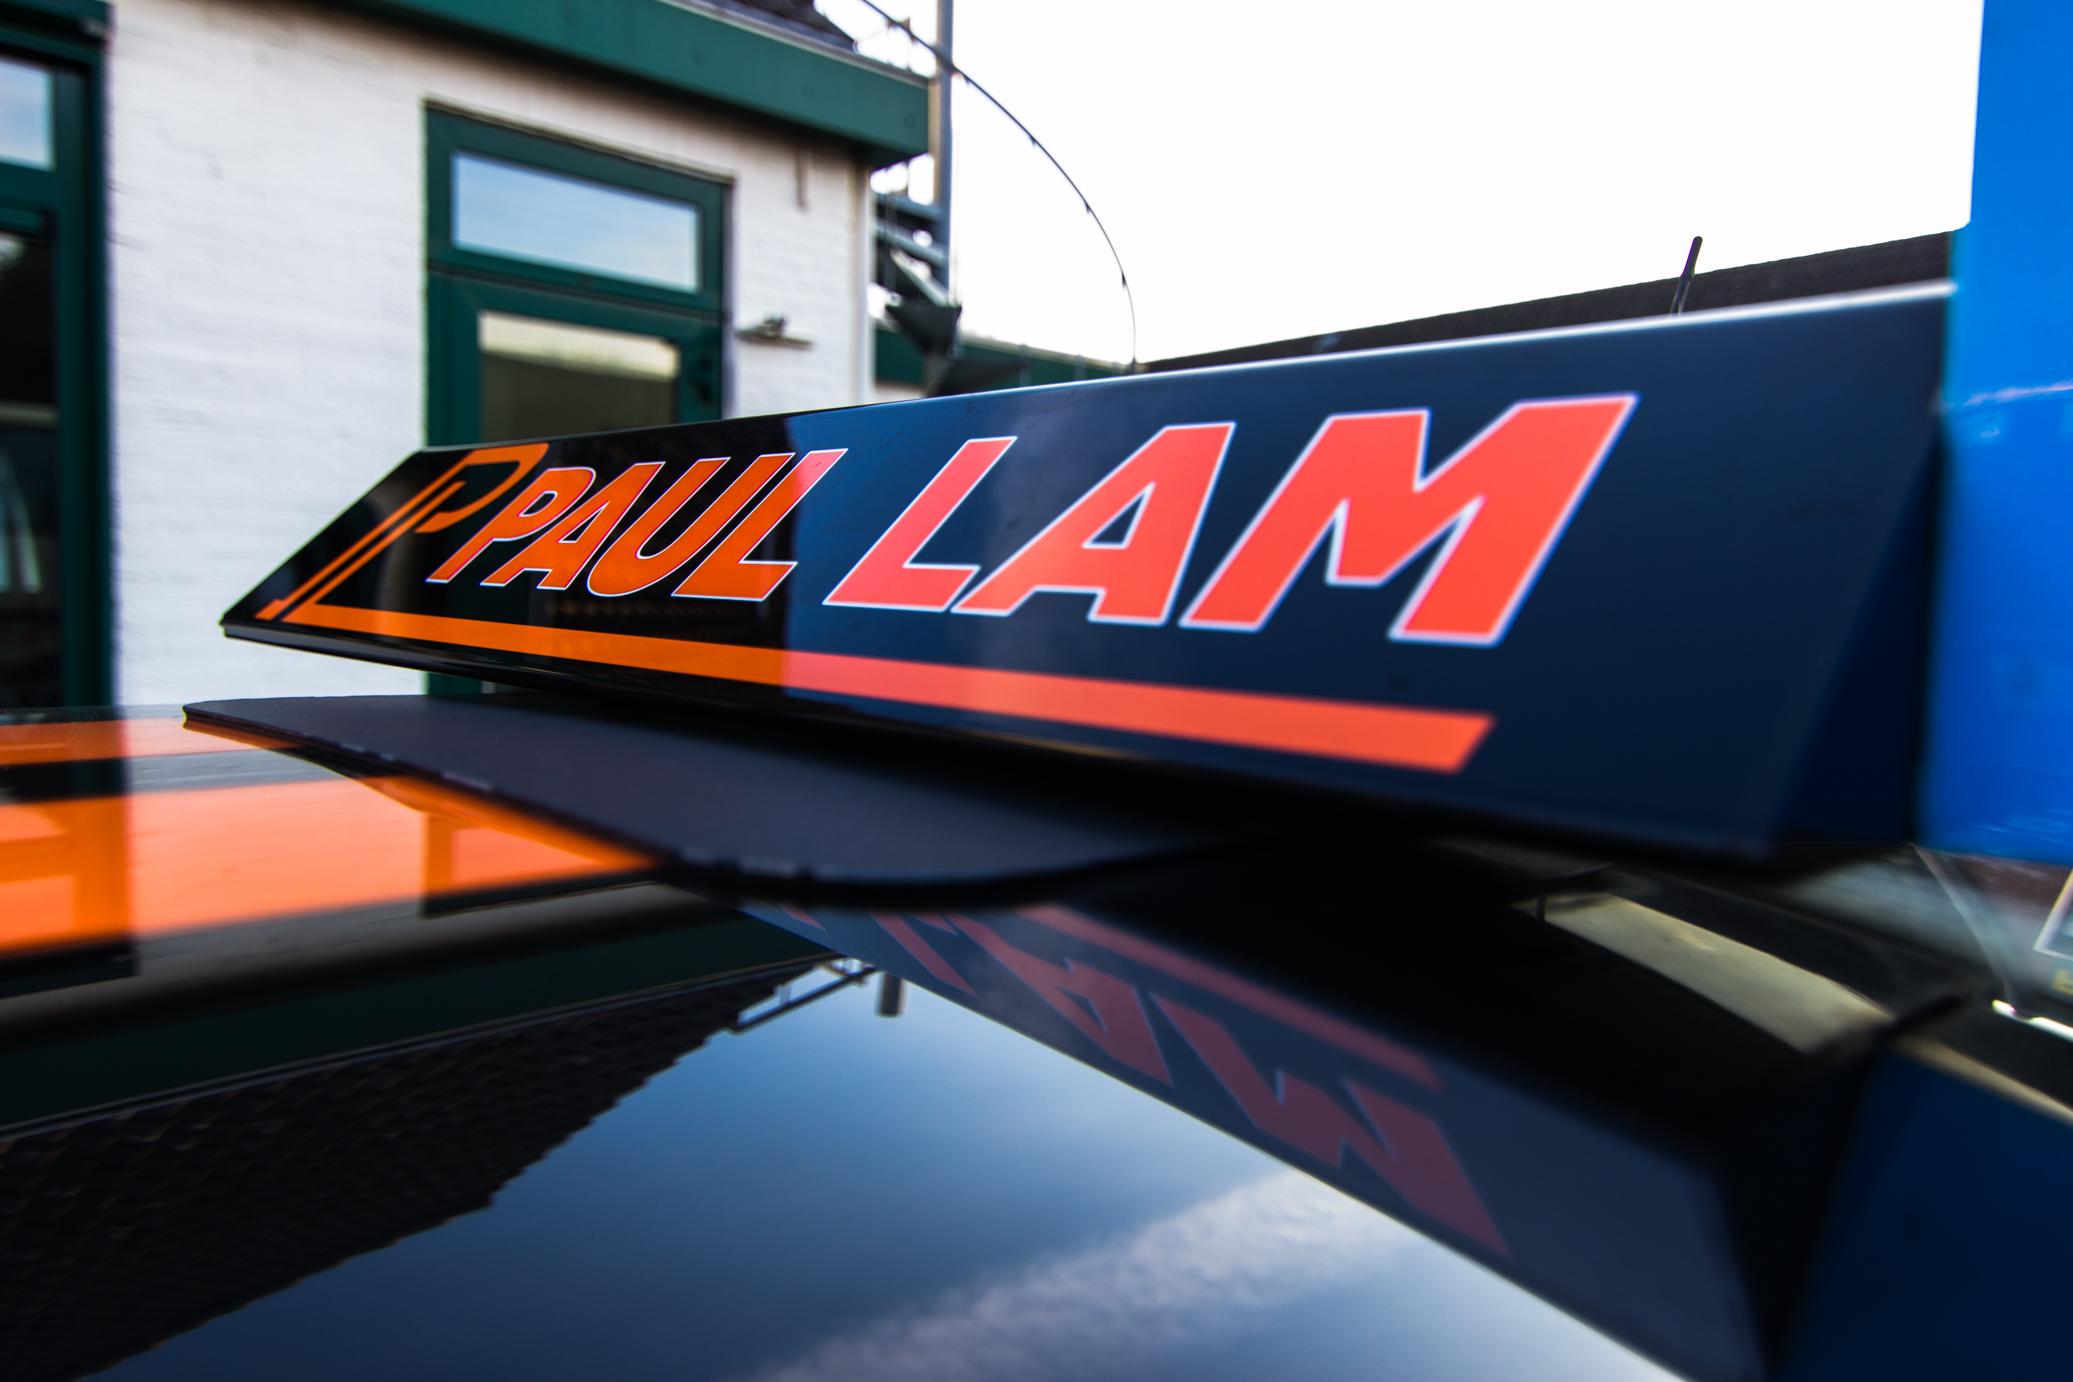 Verkeersschool Paul Lam B.V.